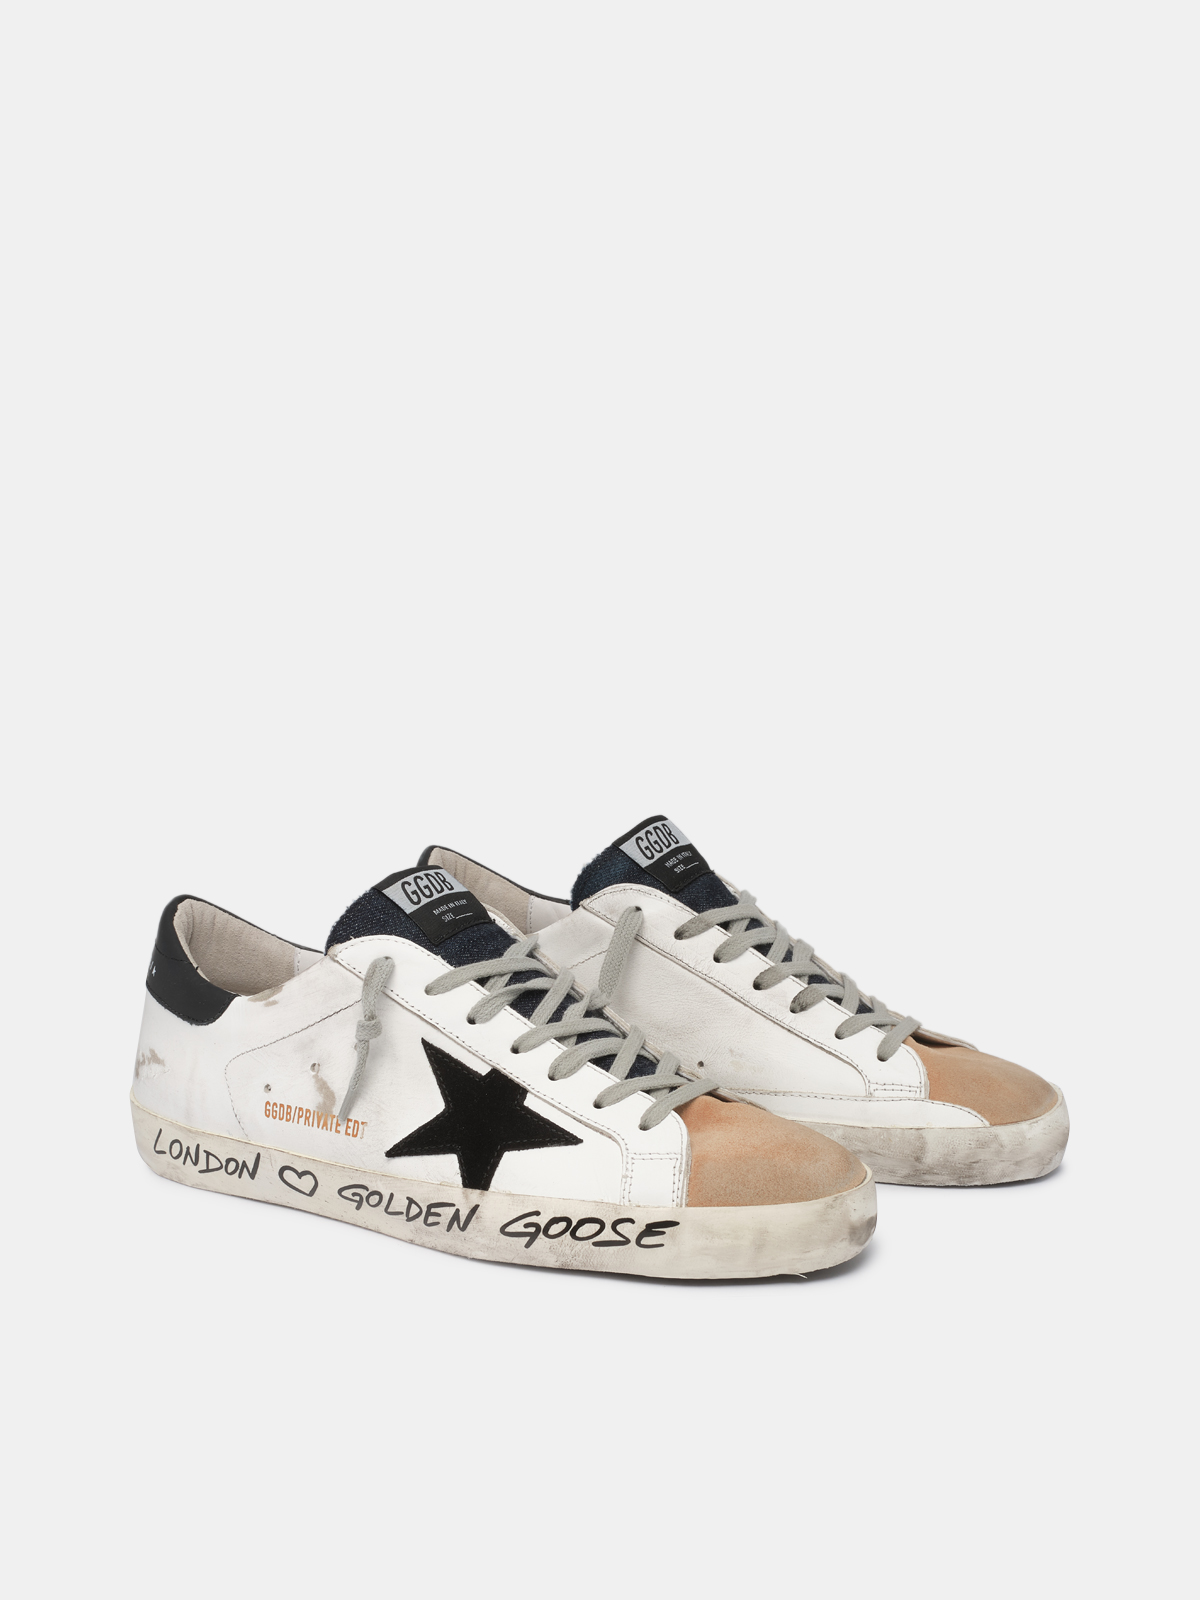 Golden Goose - White and beige Super-Star sneakers with handwritten wording in